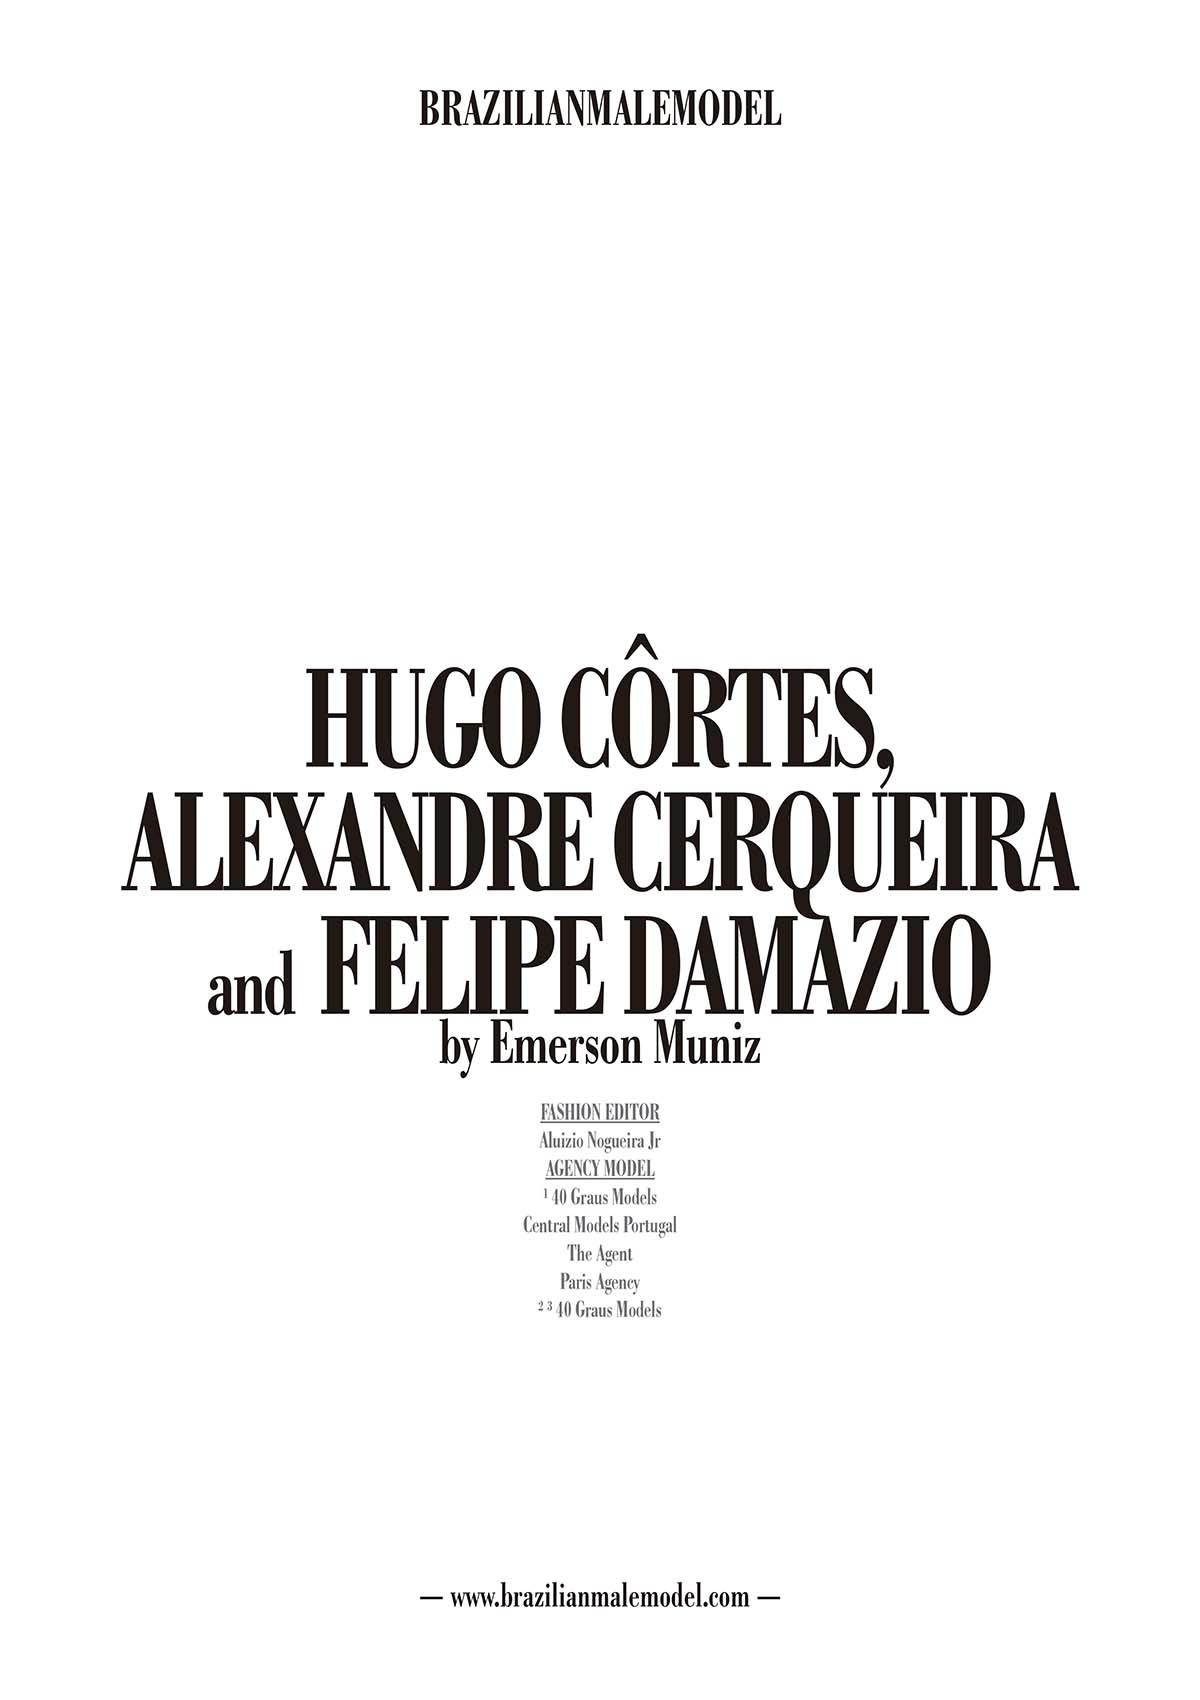 Hugo Côrtes, Alexandre Cerqueira and Felipe Damazio by Emerson Muniz for Brazilian Male Model Magazine #2